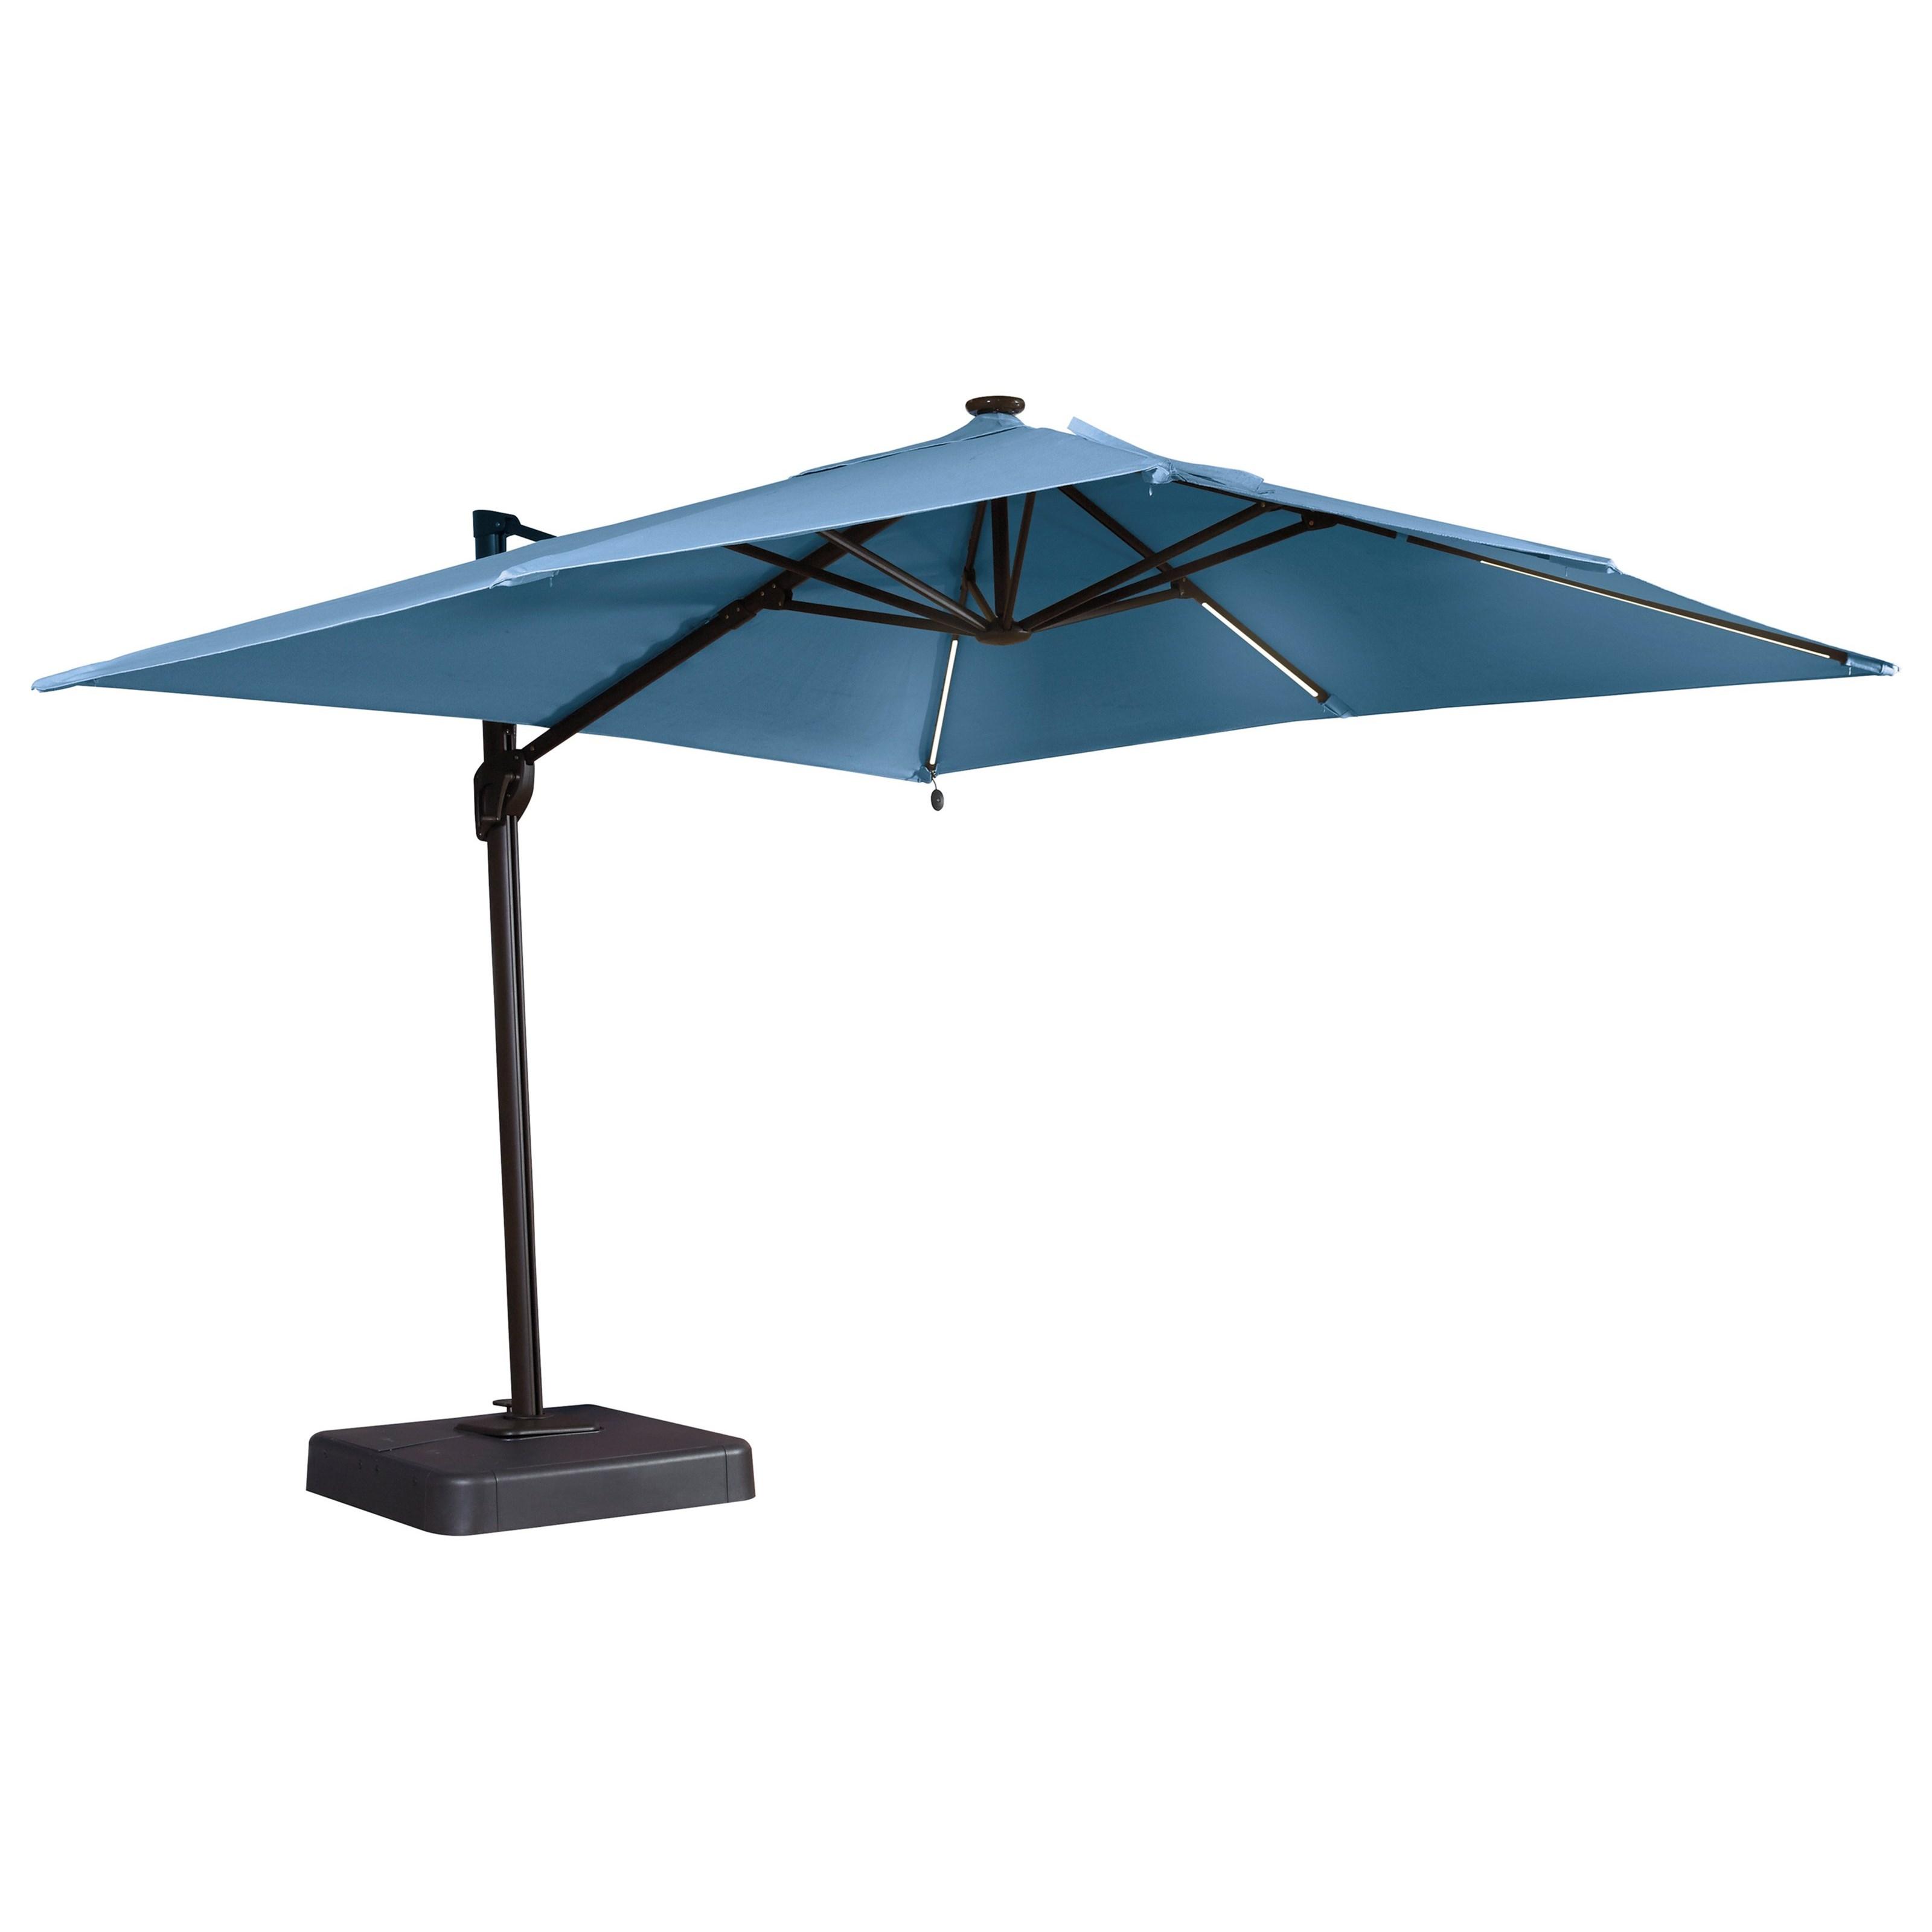 Ashley (Signature Design) Oakengrove Blue Large Cantilever Umbrella - Item Number: P017-992